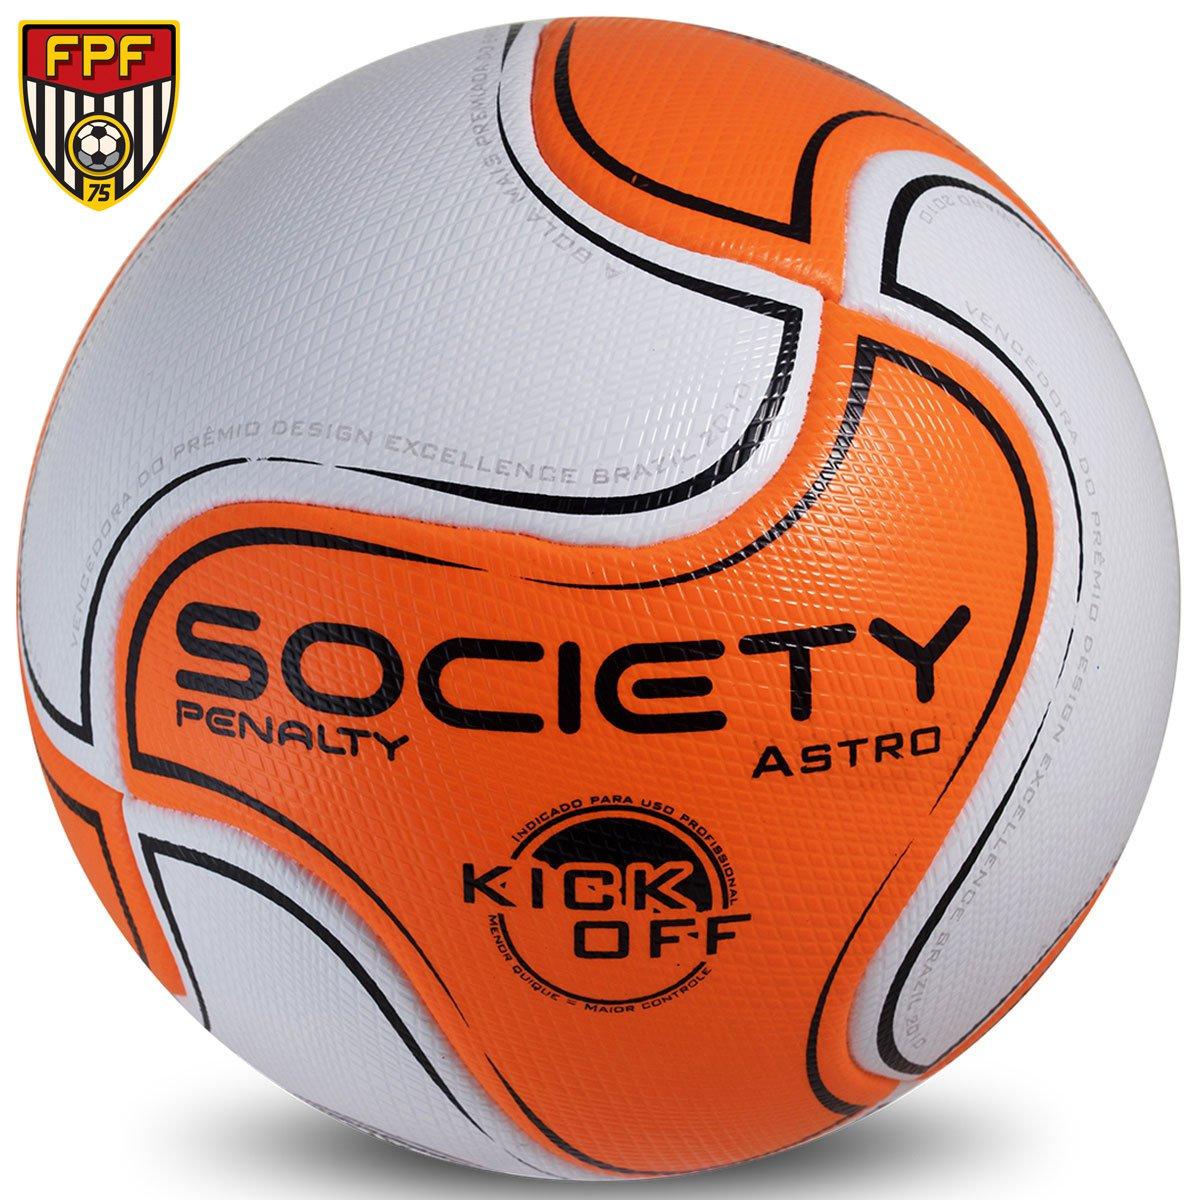 2eaeb379bc834 Bola Futebol Penalty 8 S11 Astro Kick Off 6 Society - Compre Agora ...